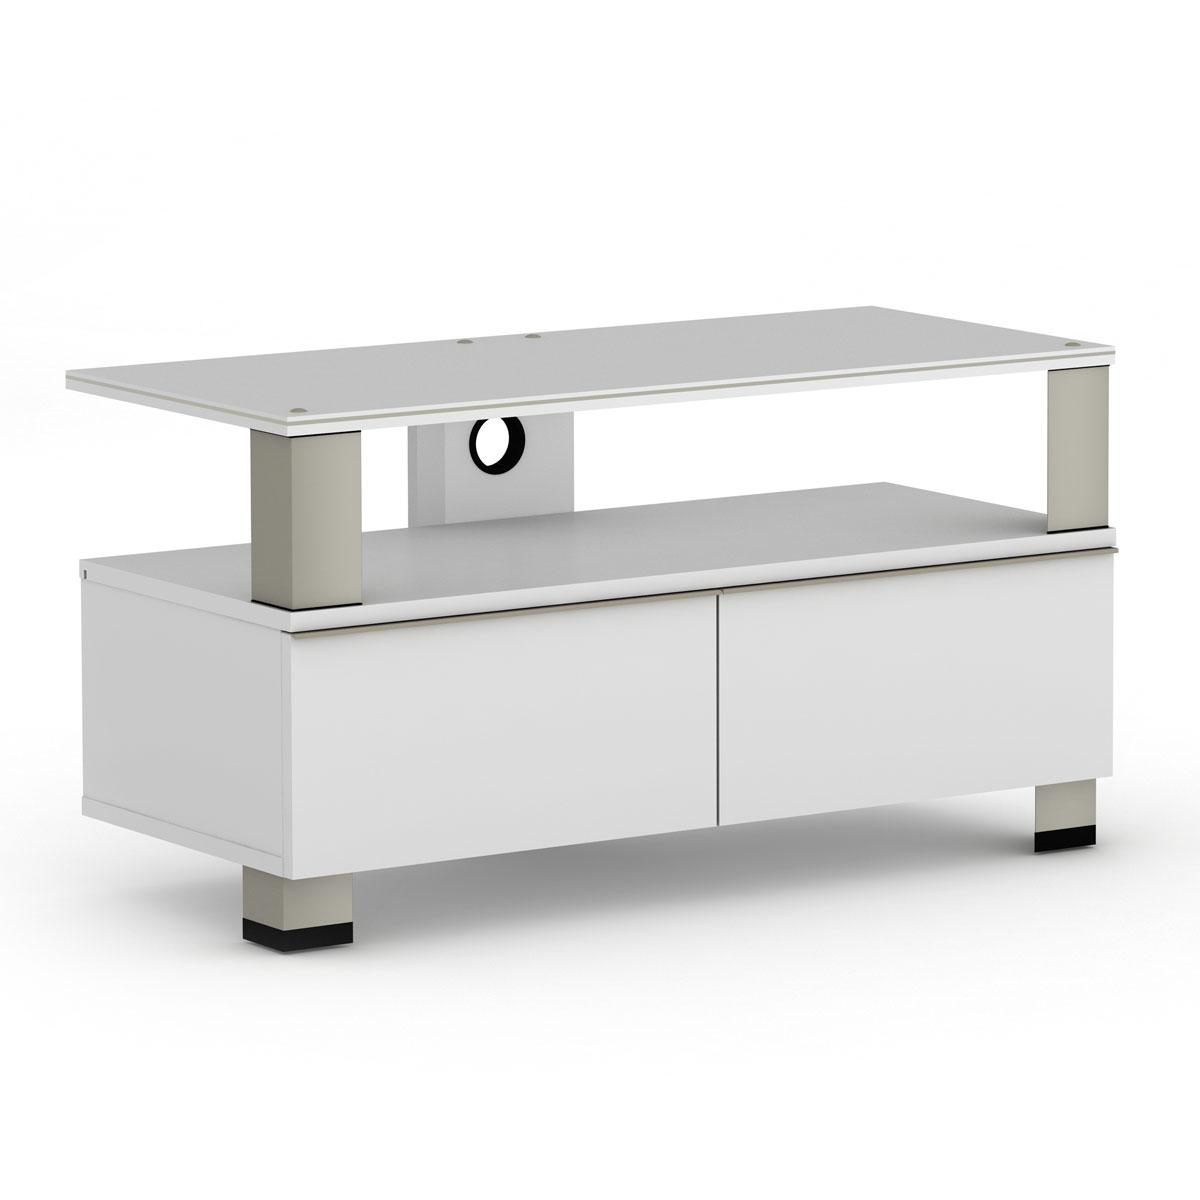 Elmob tura tu 095 01 blanc meuble tv elmob sur - Meuble ecran videoprojecteur ...